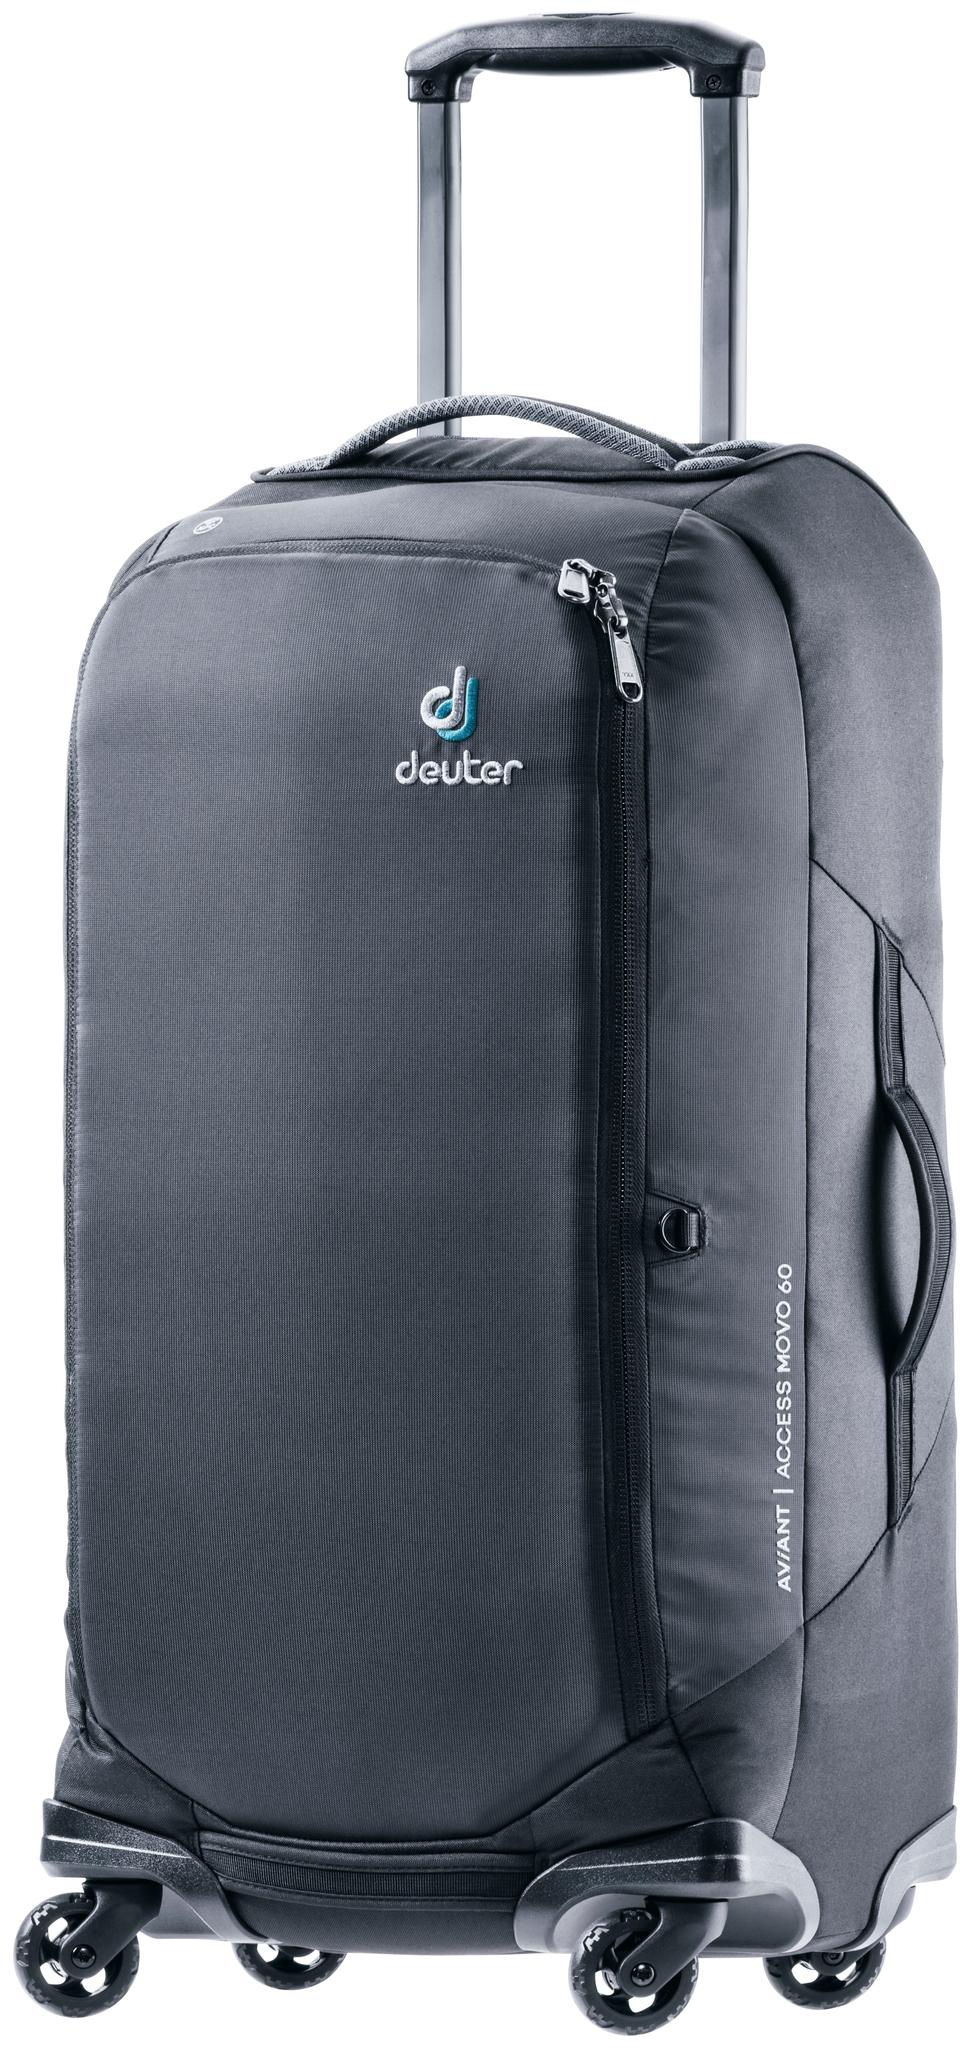 Сумки на колесах Сумка рюкзак на колесах Deuter Aviant Access Movo 60 3500121-7000-AviantAccessMovo60-w20-d0.jpg